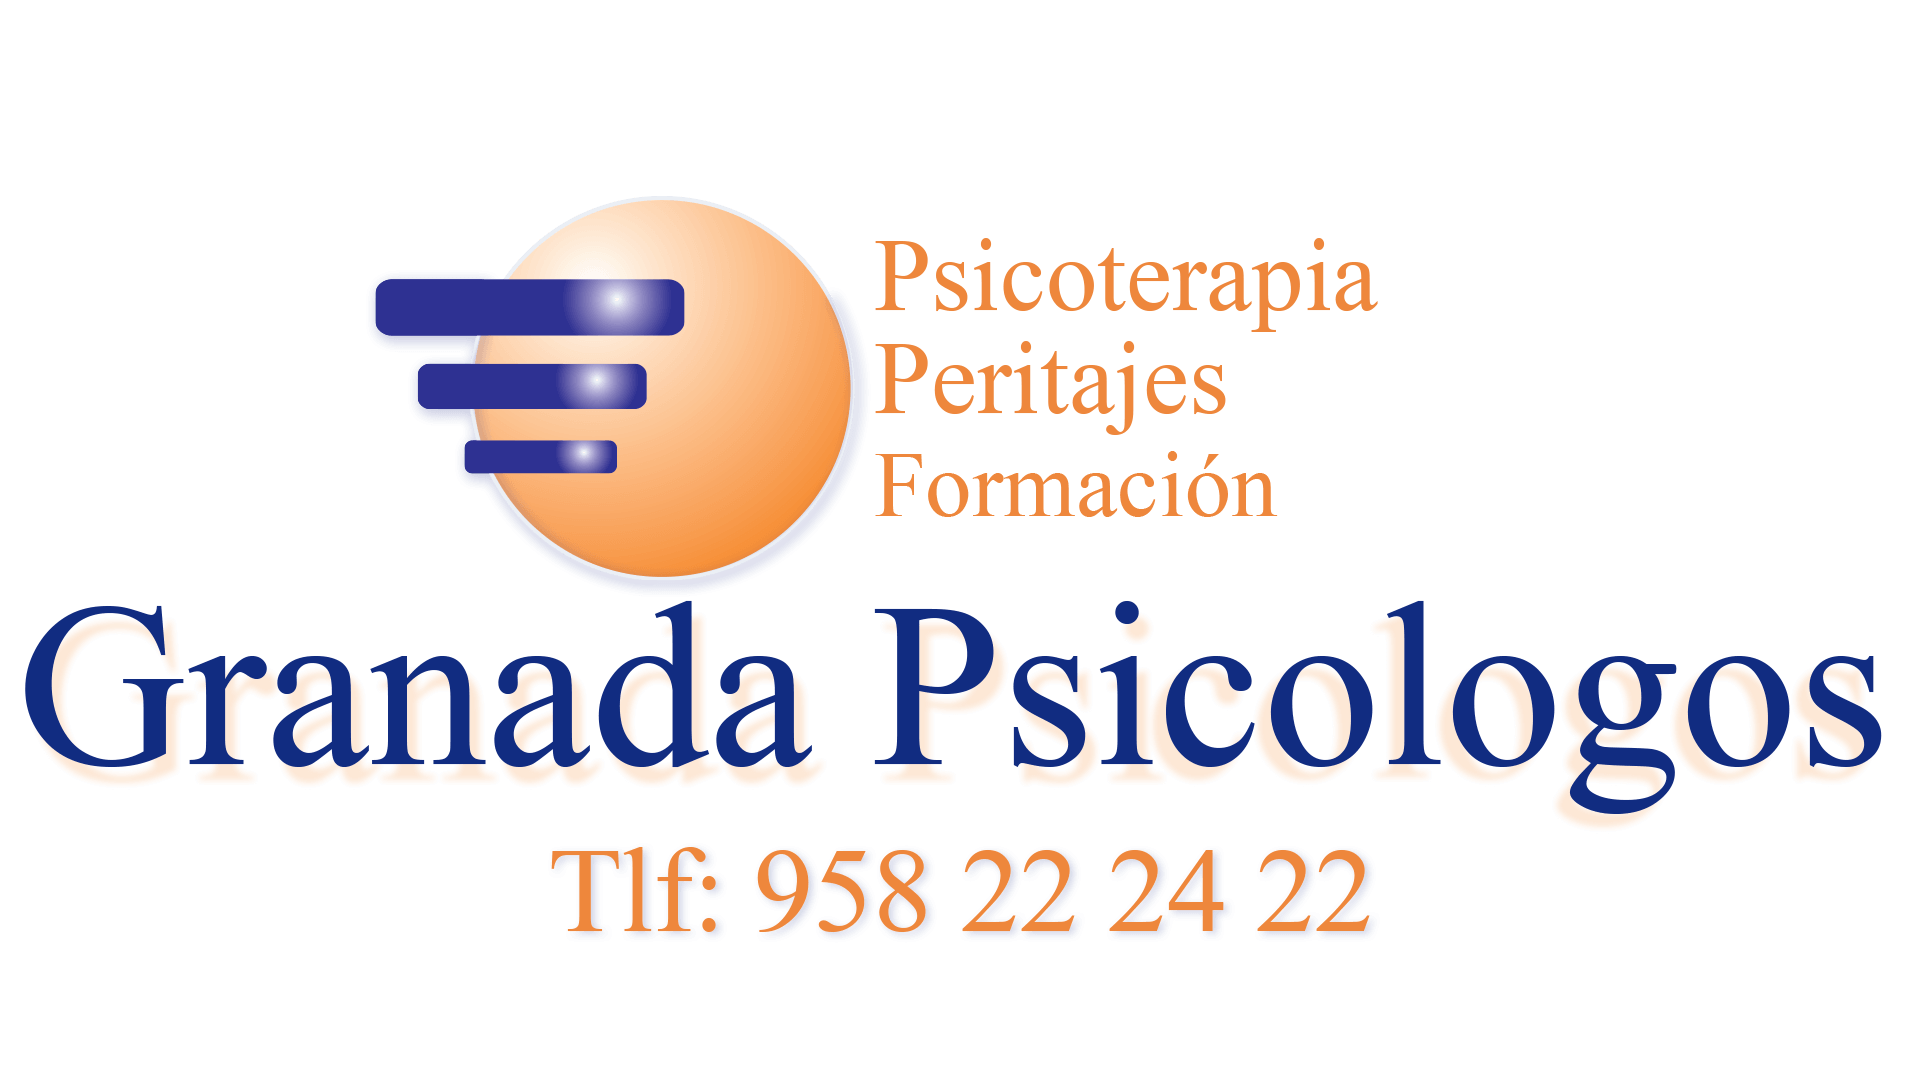 Psicologos Granada